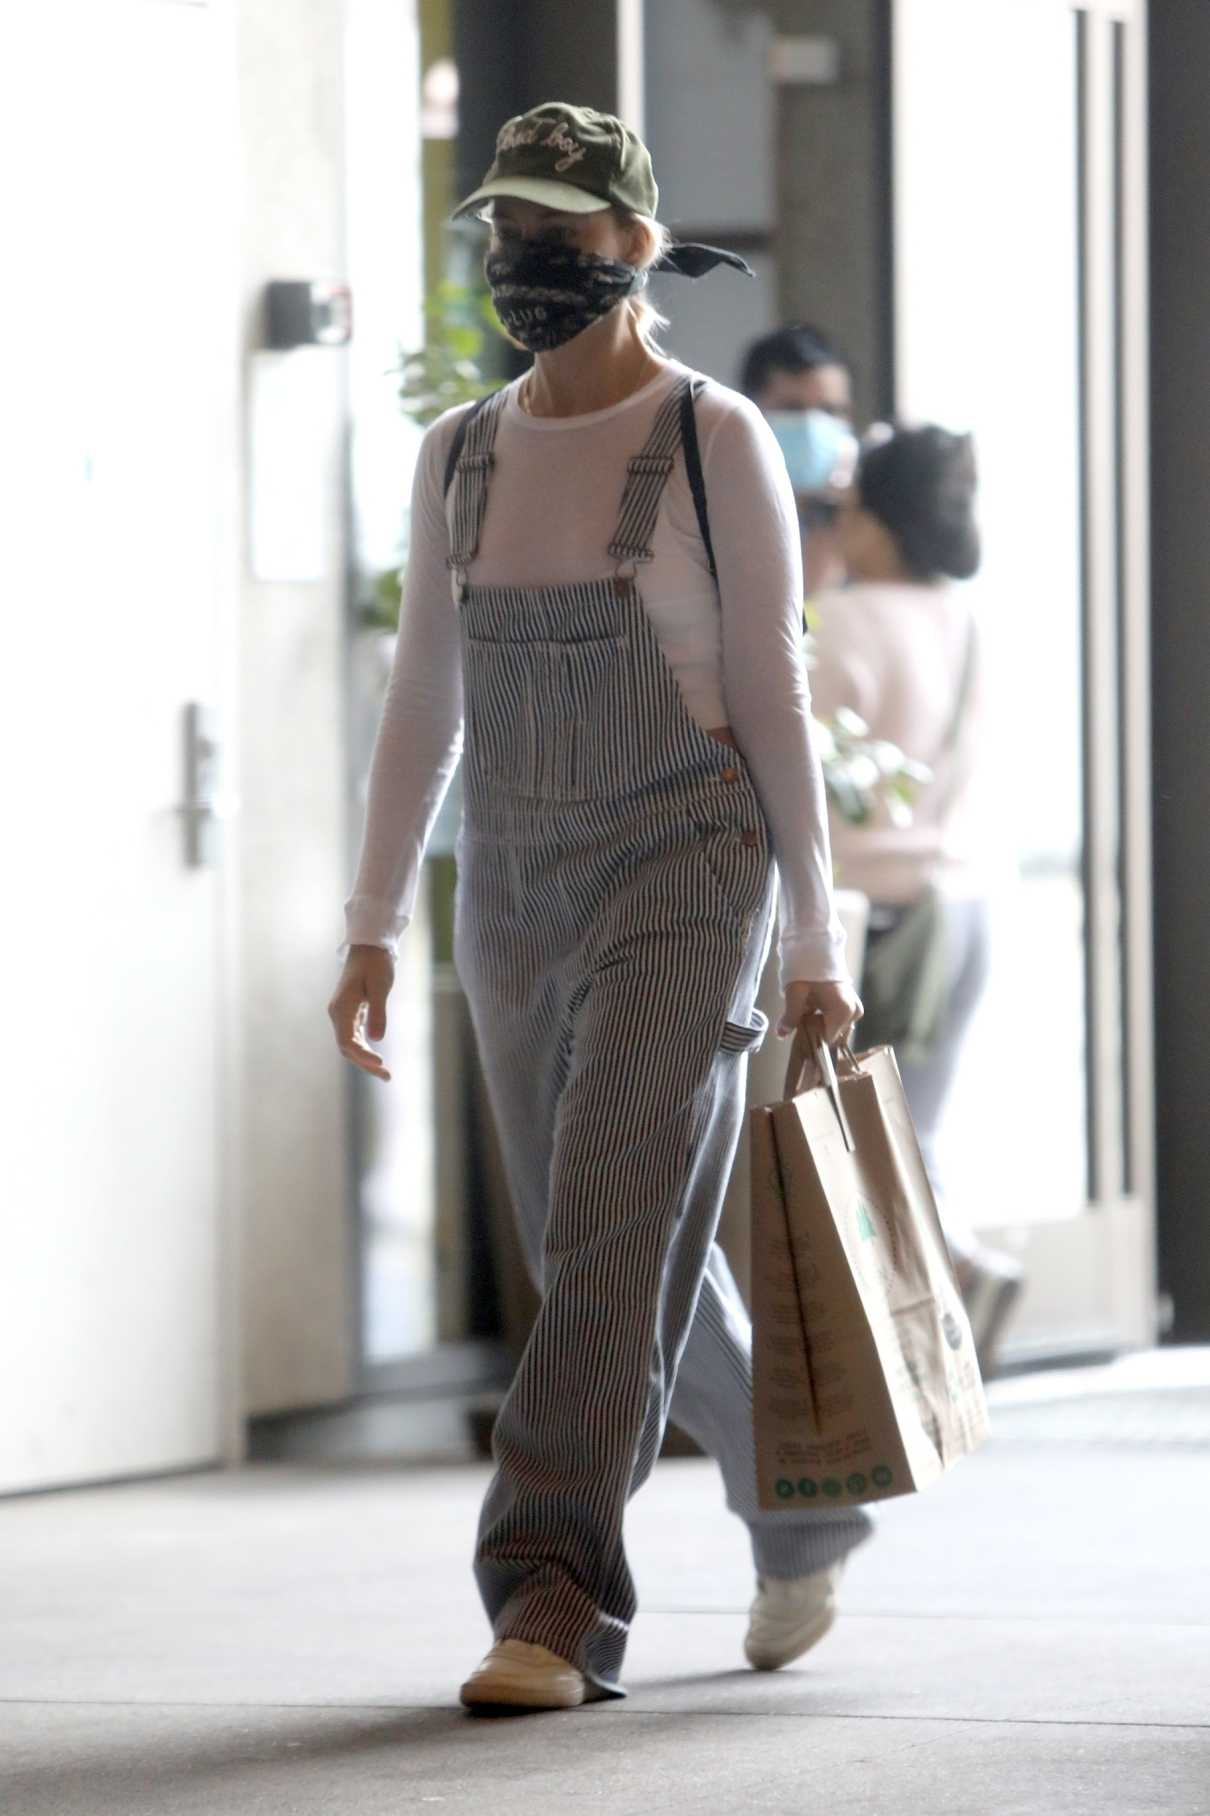 Margot Robbie in a Striped Jumpsuit